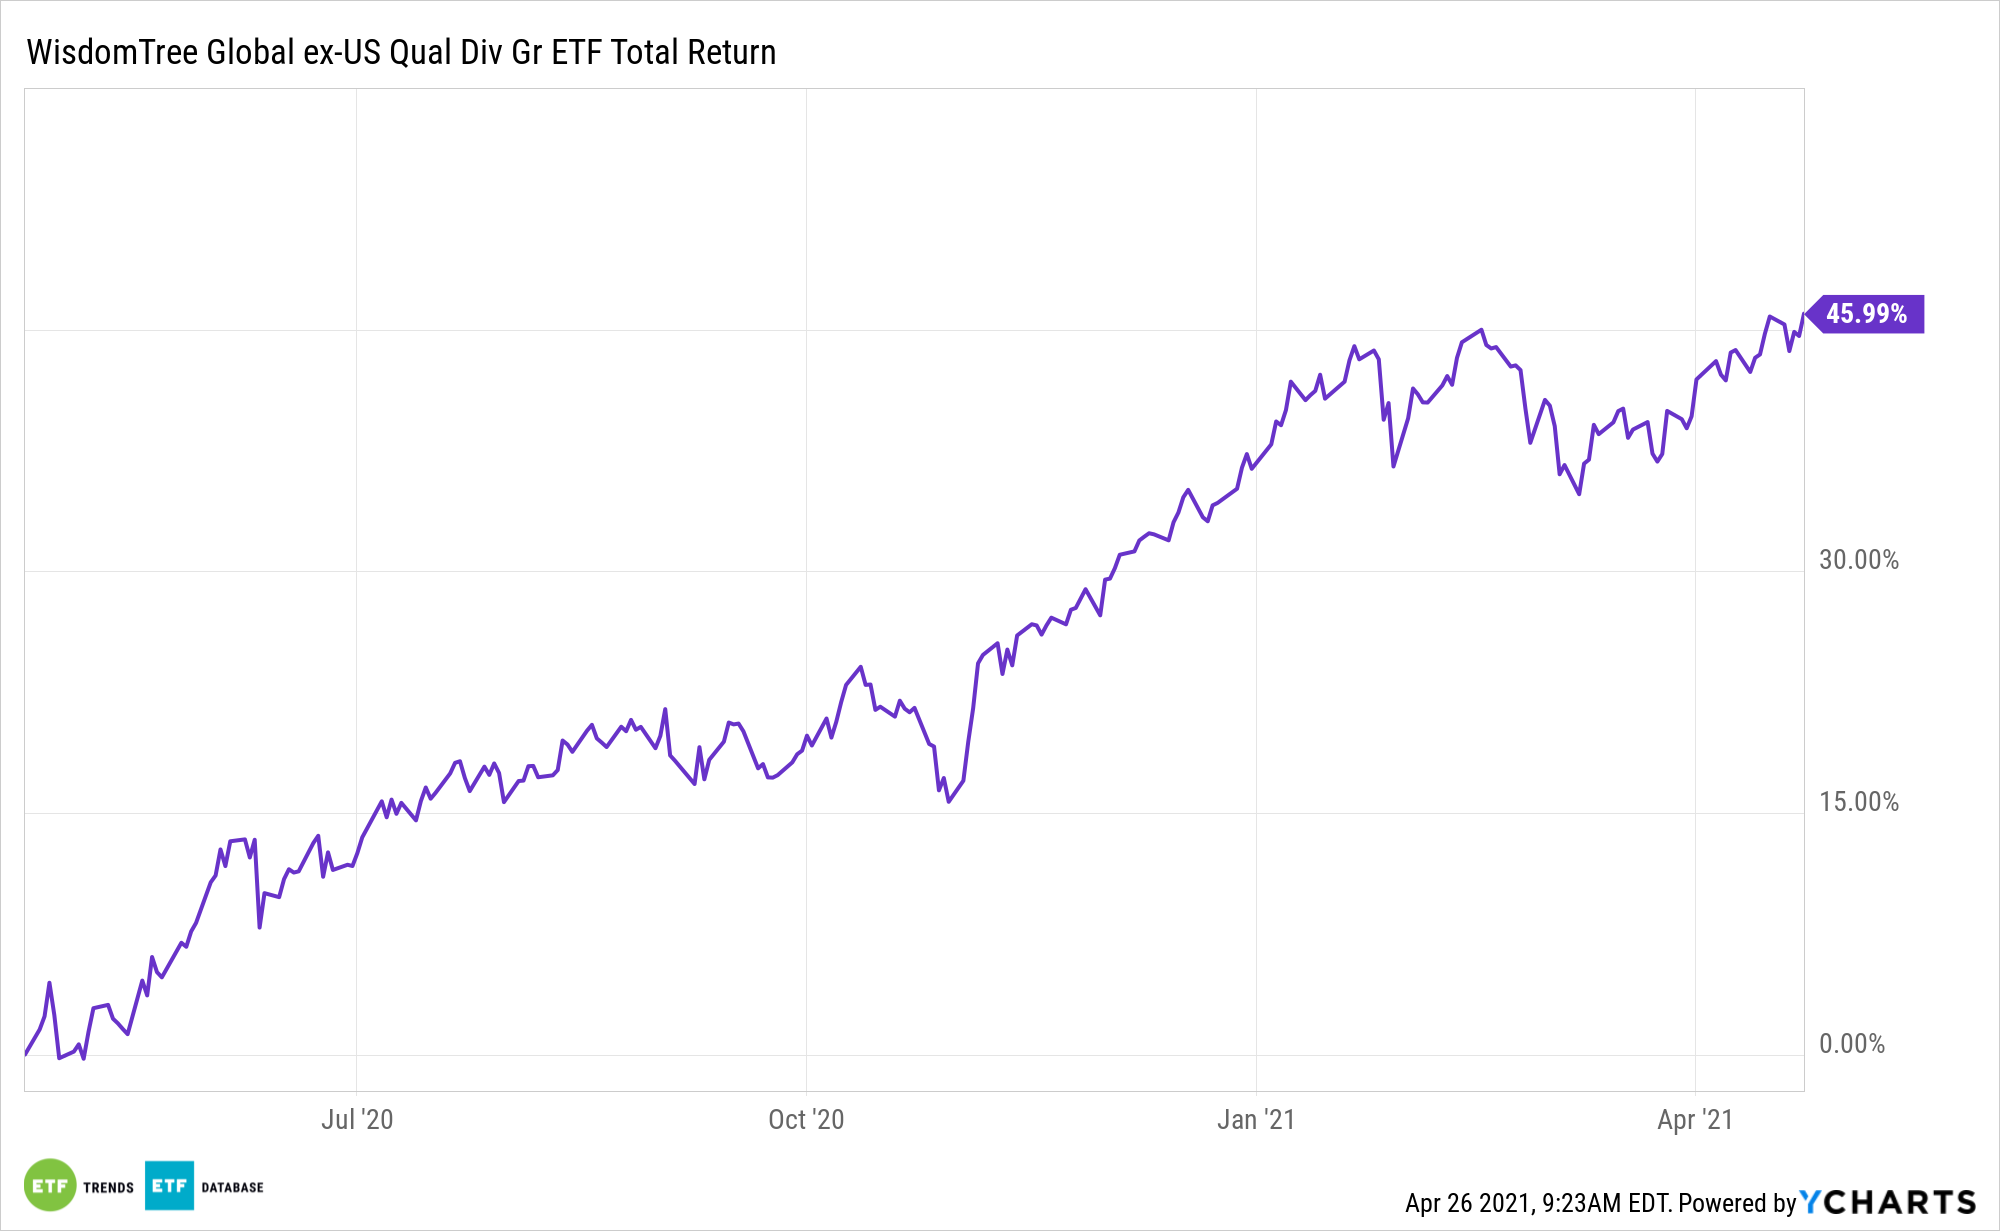 DNL 1 Year Total Return